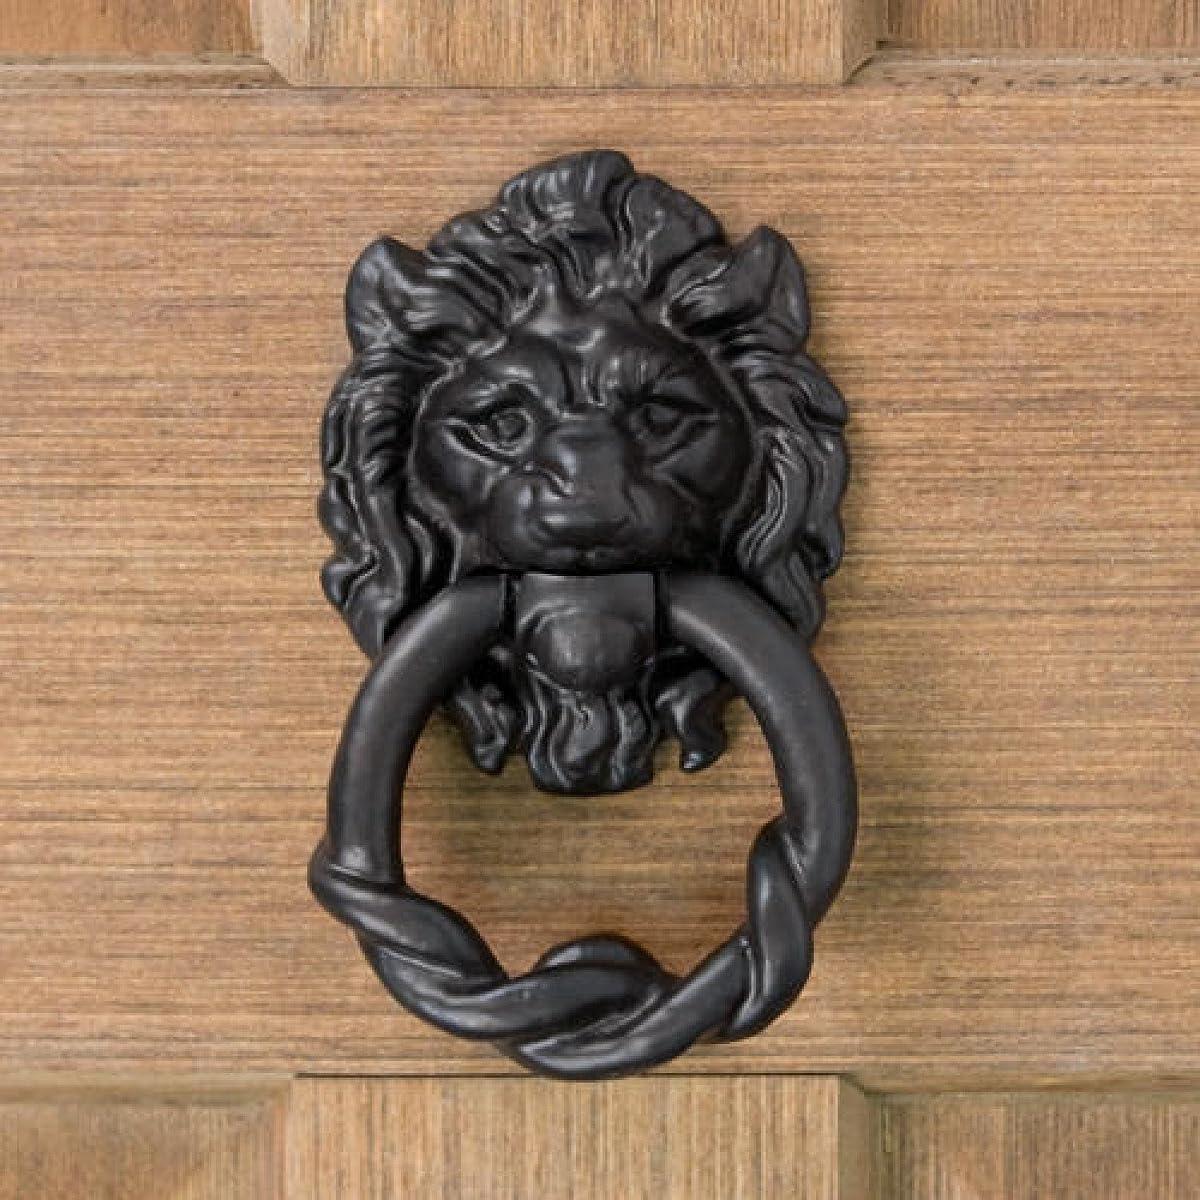 Casa Hardware Hand-Forged Iron Lion Head Door Knocker - Black Powder Coat